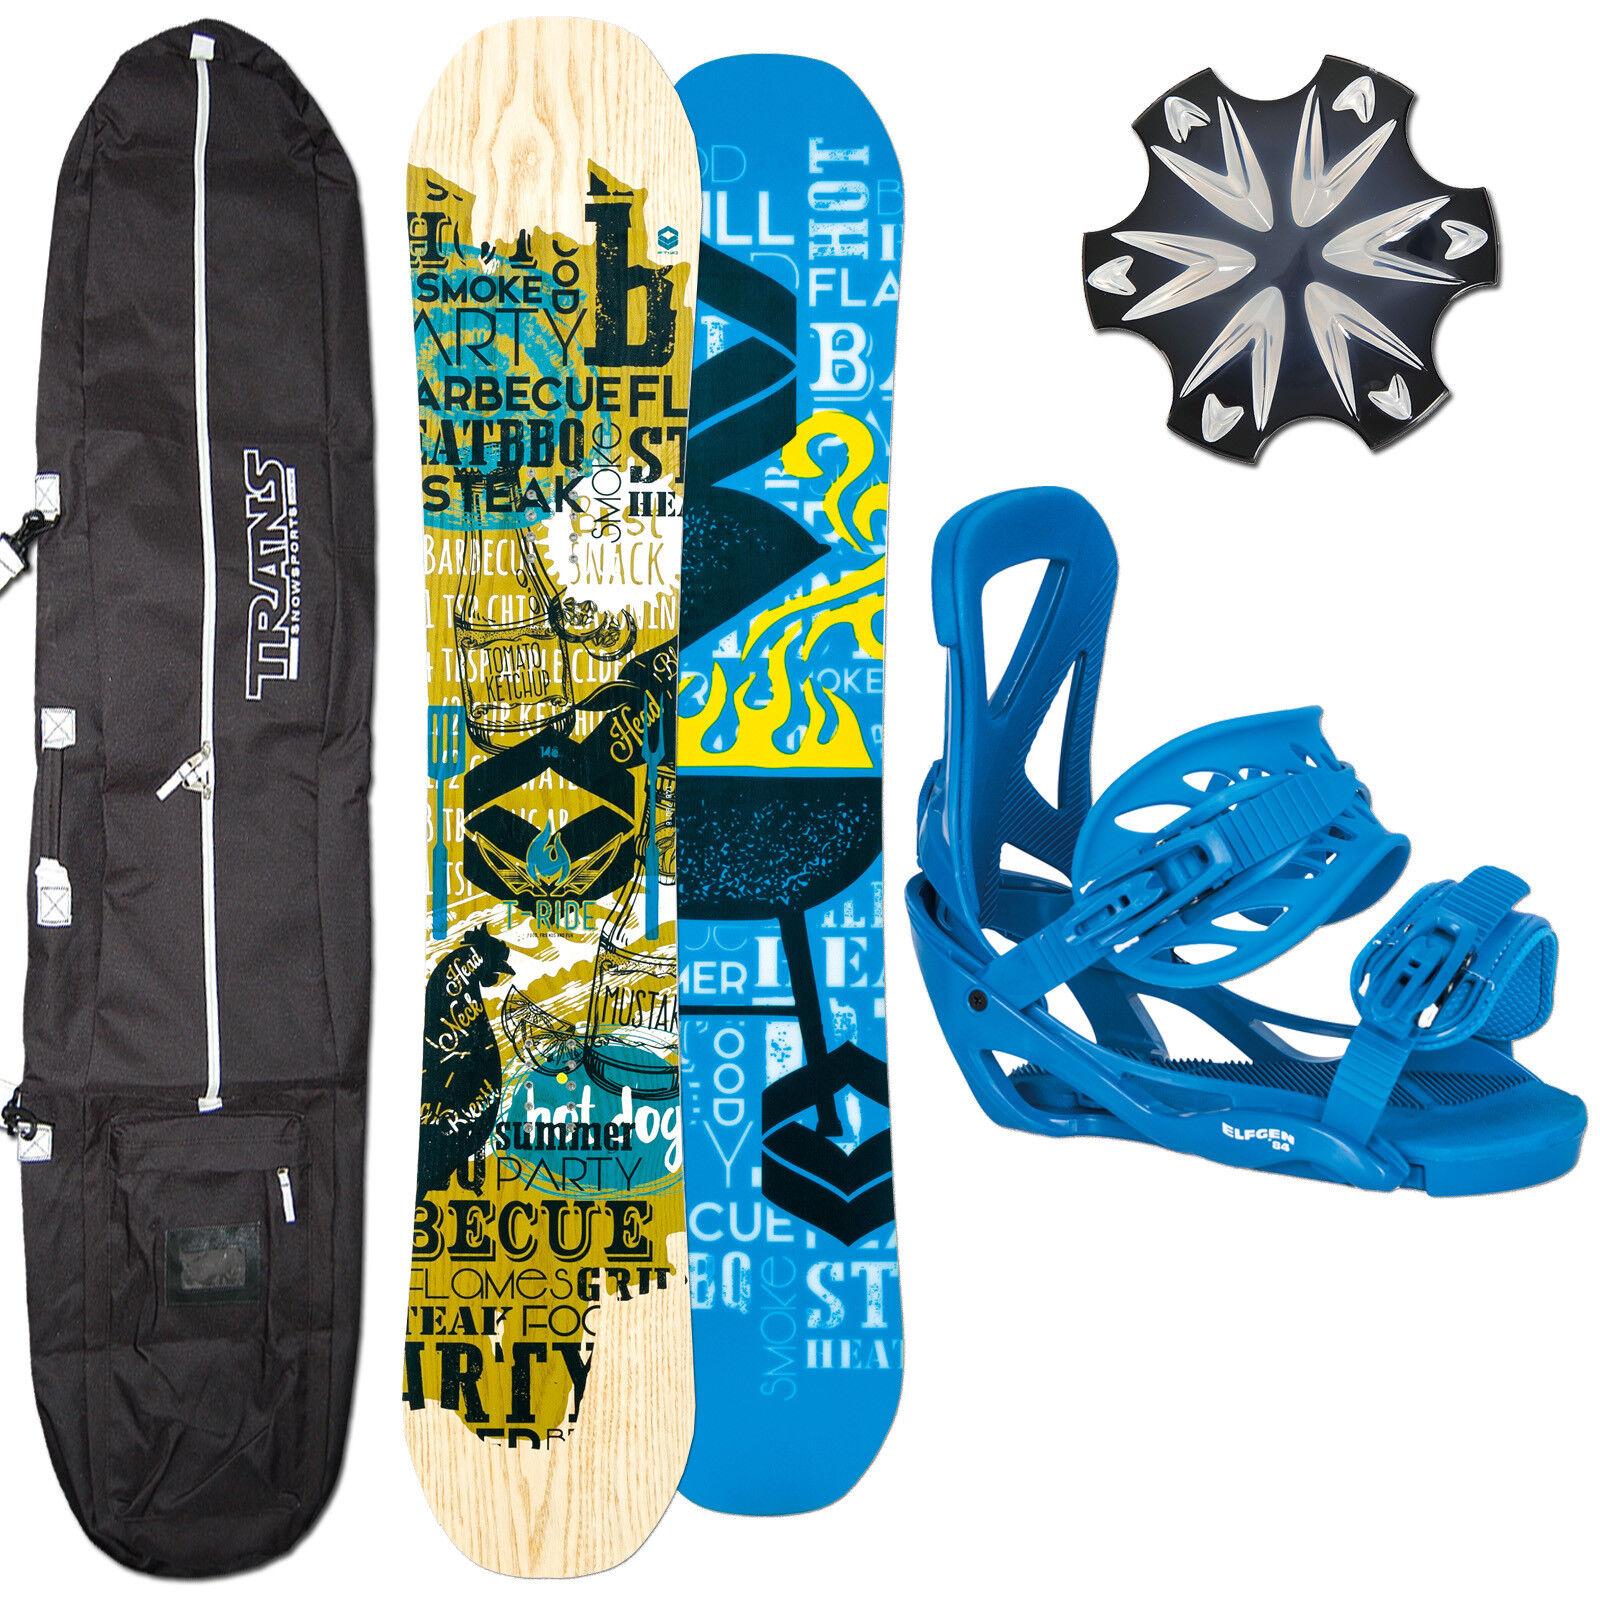 Uomo Camber Snowboard Ftwo TRide 162 cm Ampio 2018  Elfgen Attac  Erl L